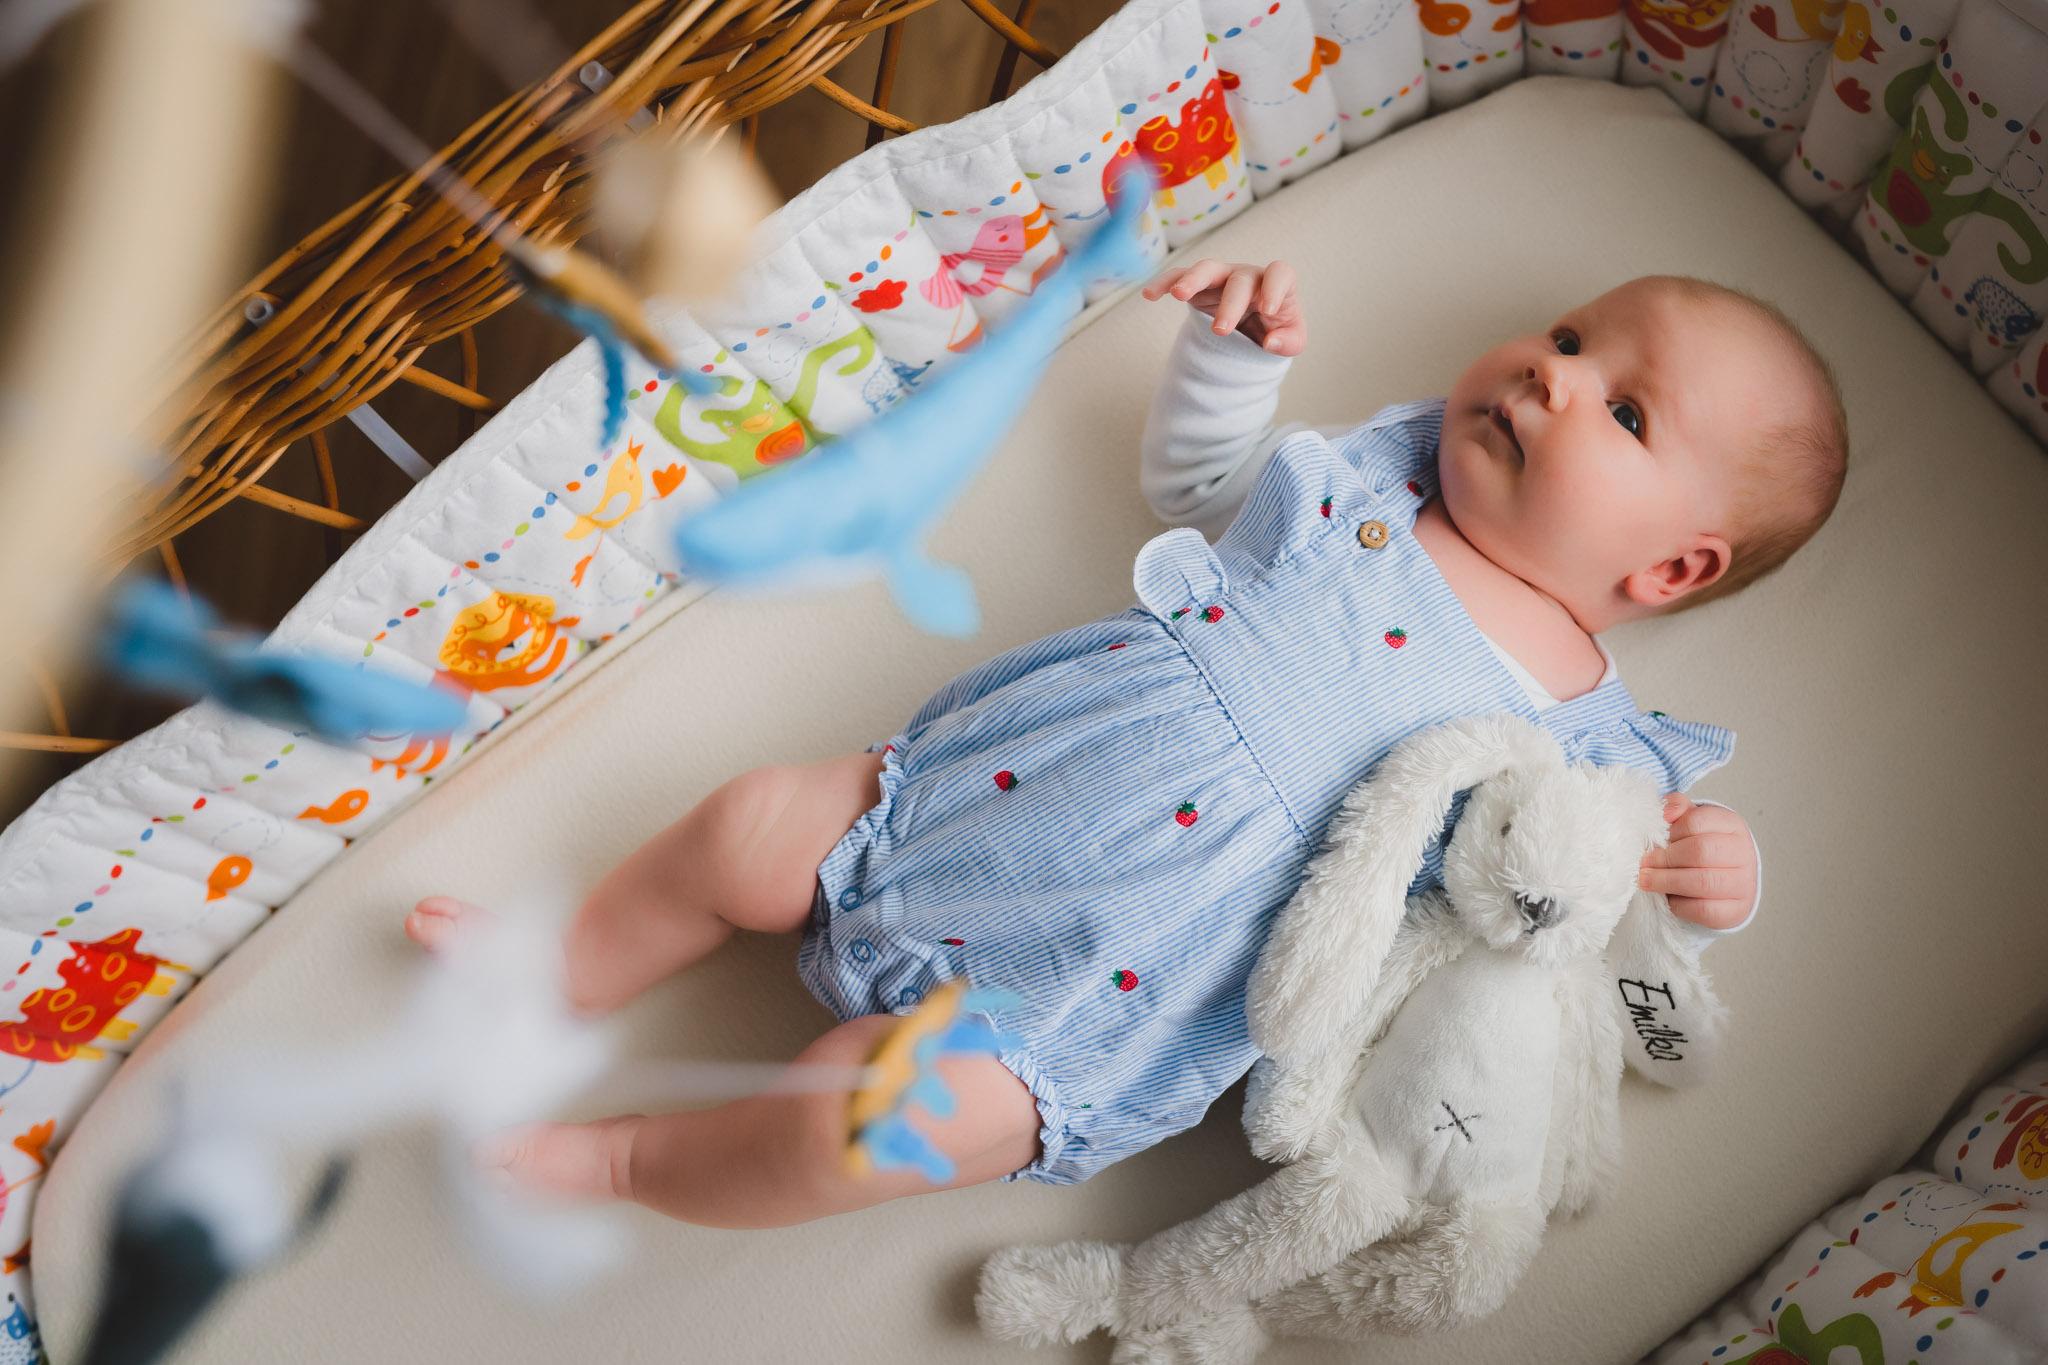 Lifestyle_newborn_foceni_mininek_v_pohodli_dom_ova005